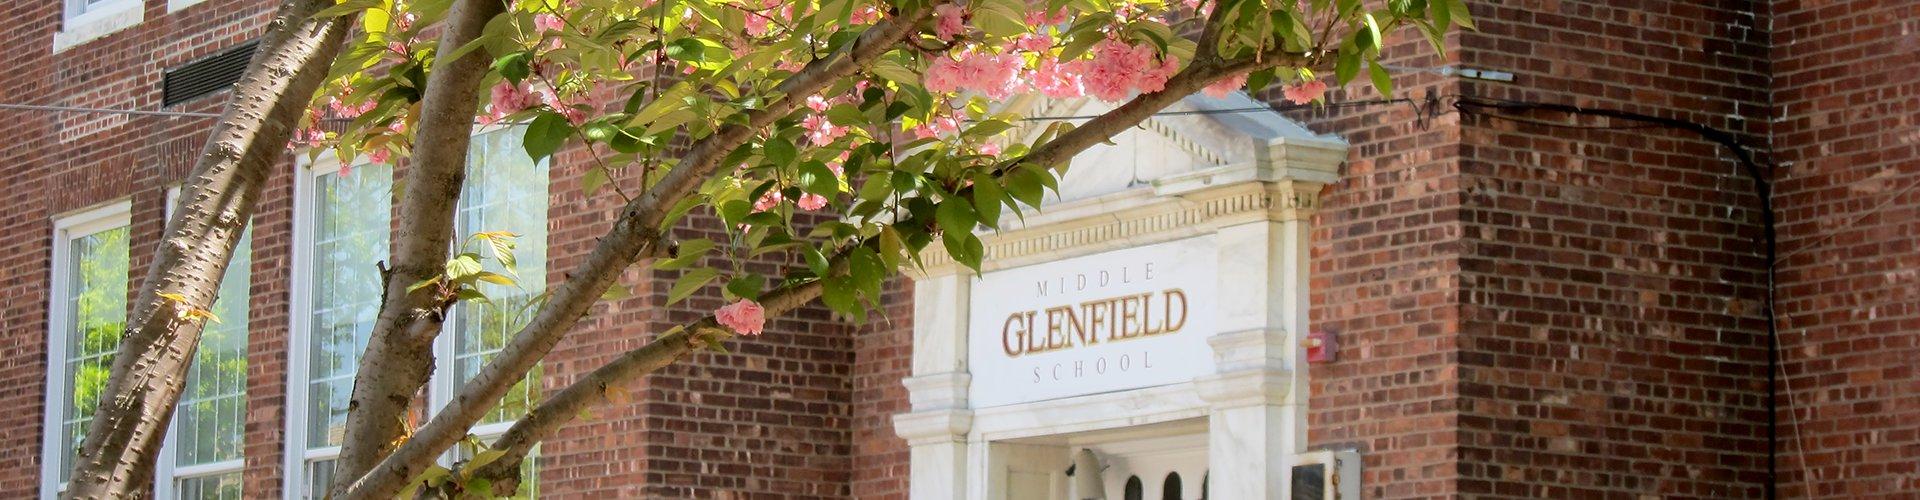 Glenfield School Toasts